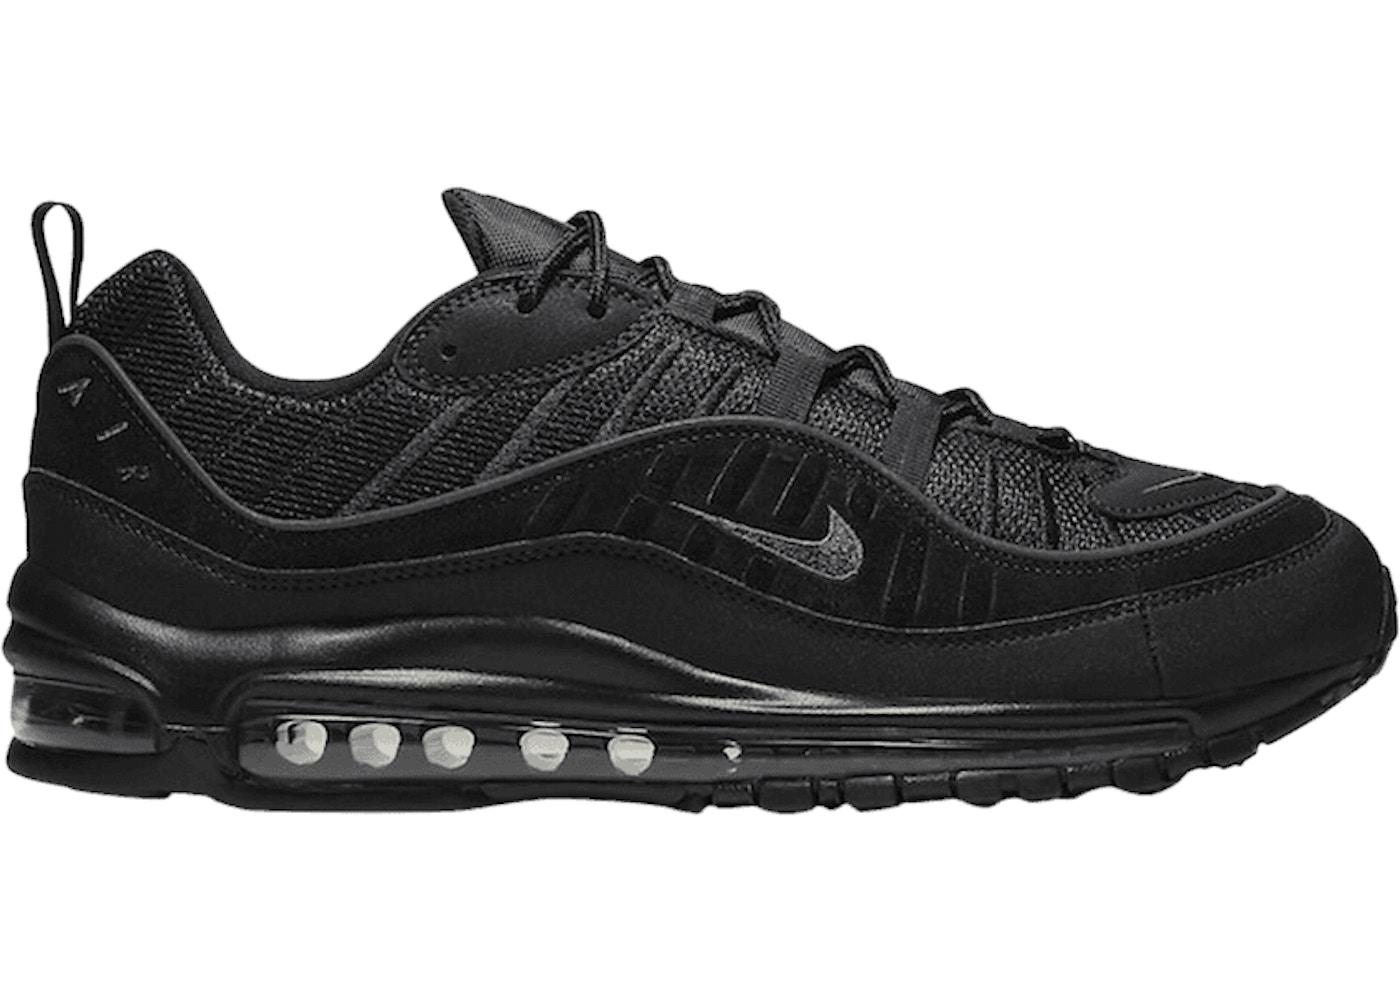 Nike Air Max 98 Black Anthracite Black Sole